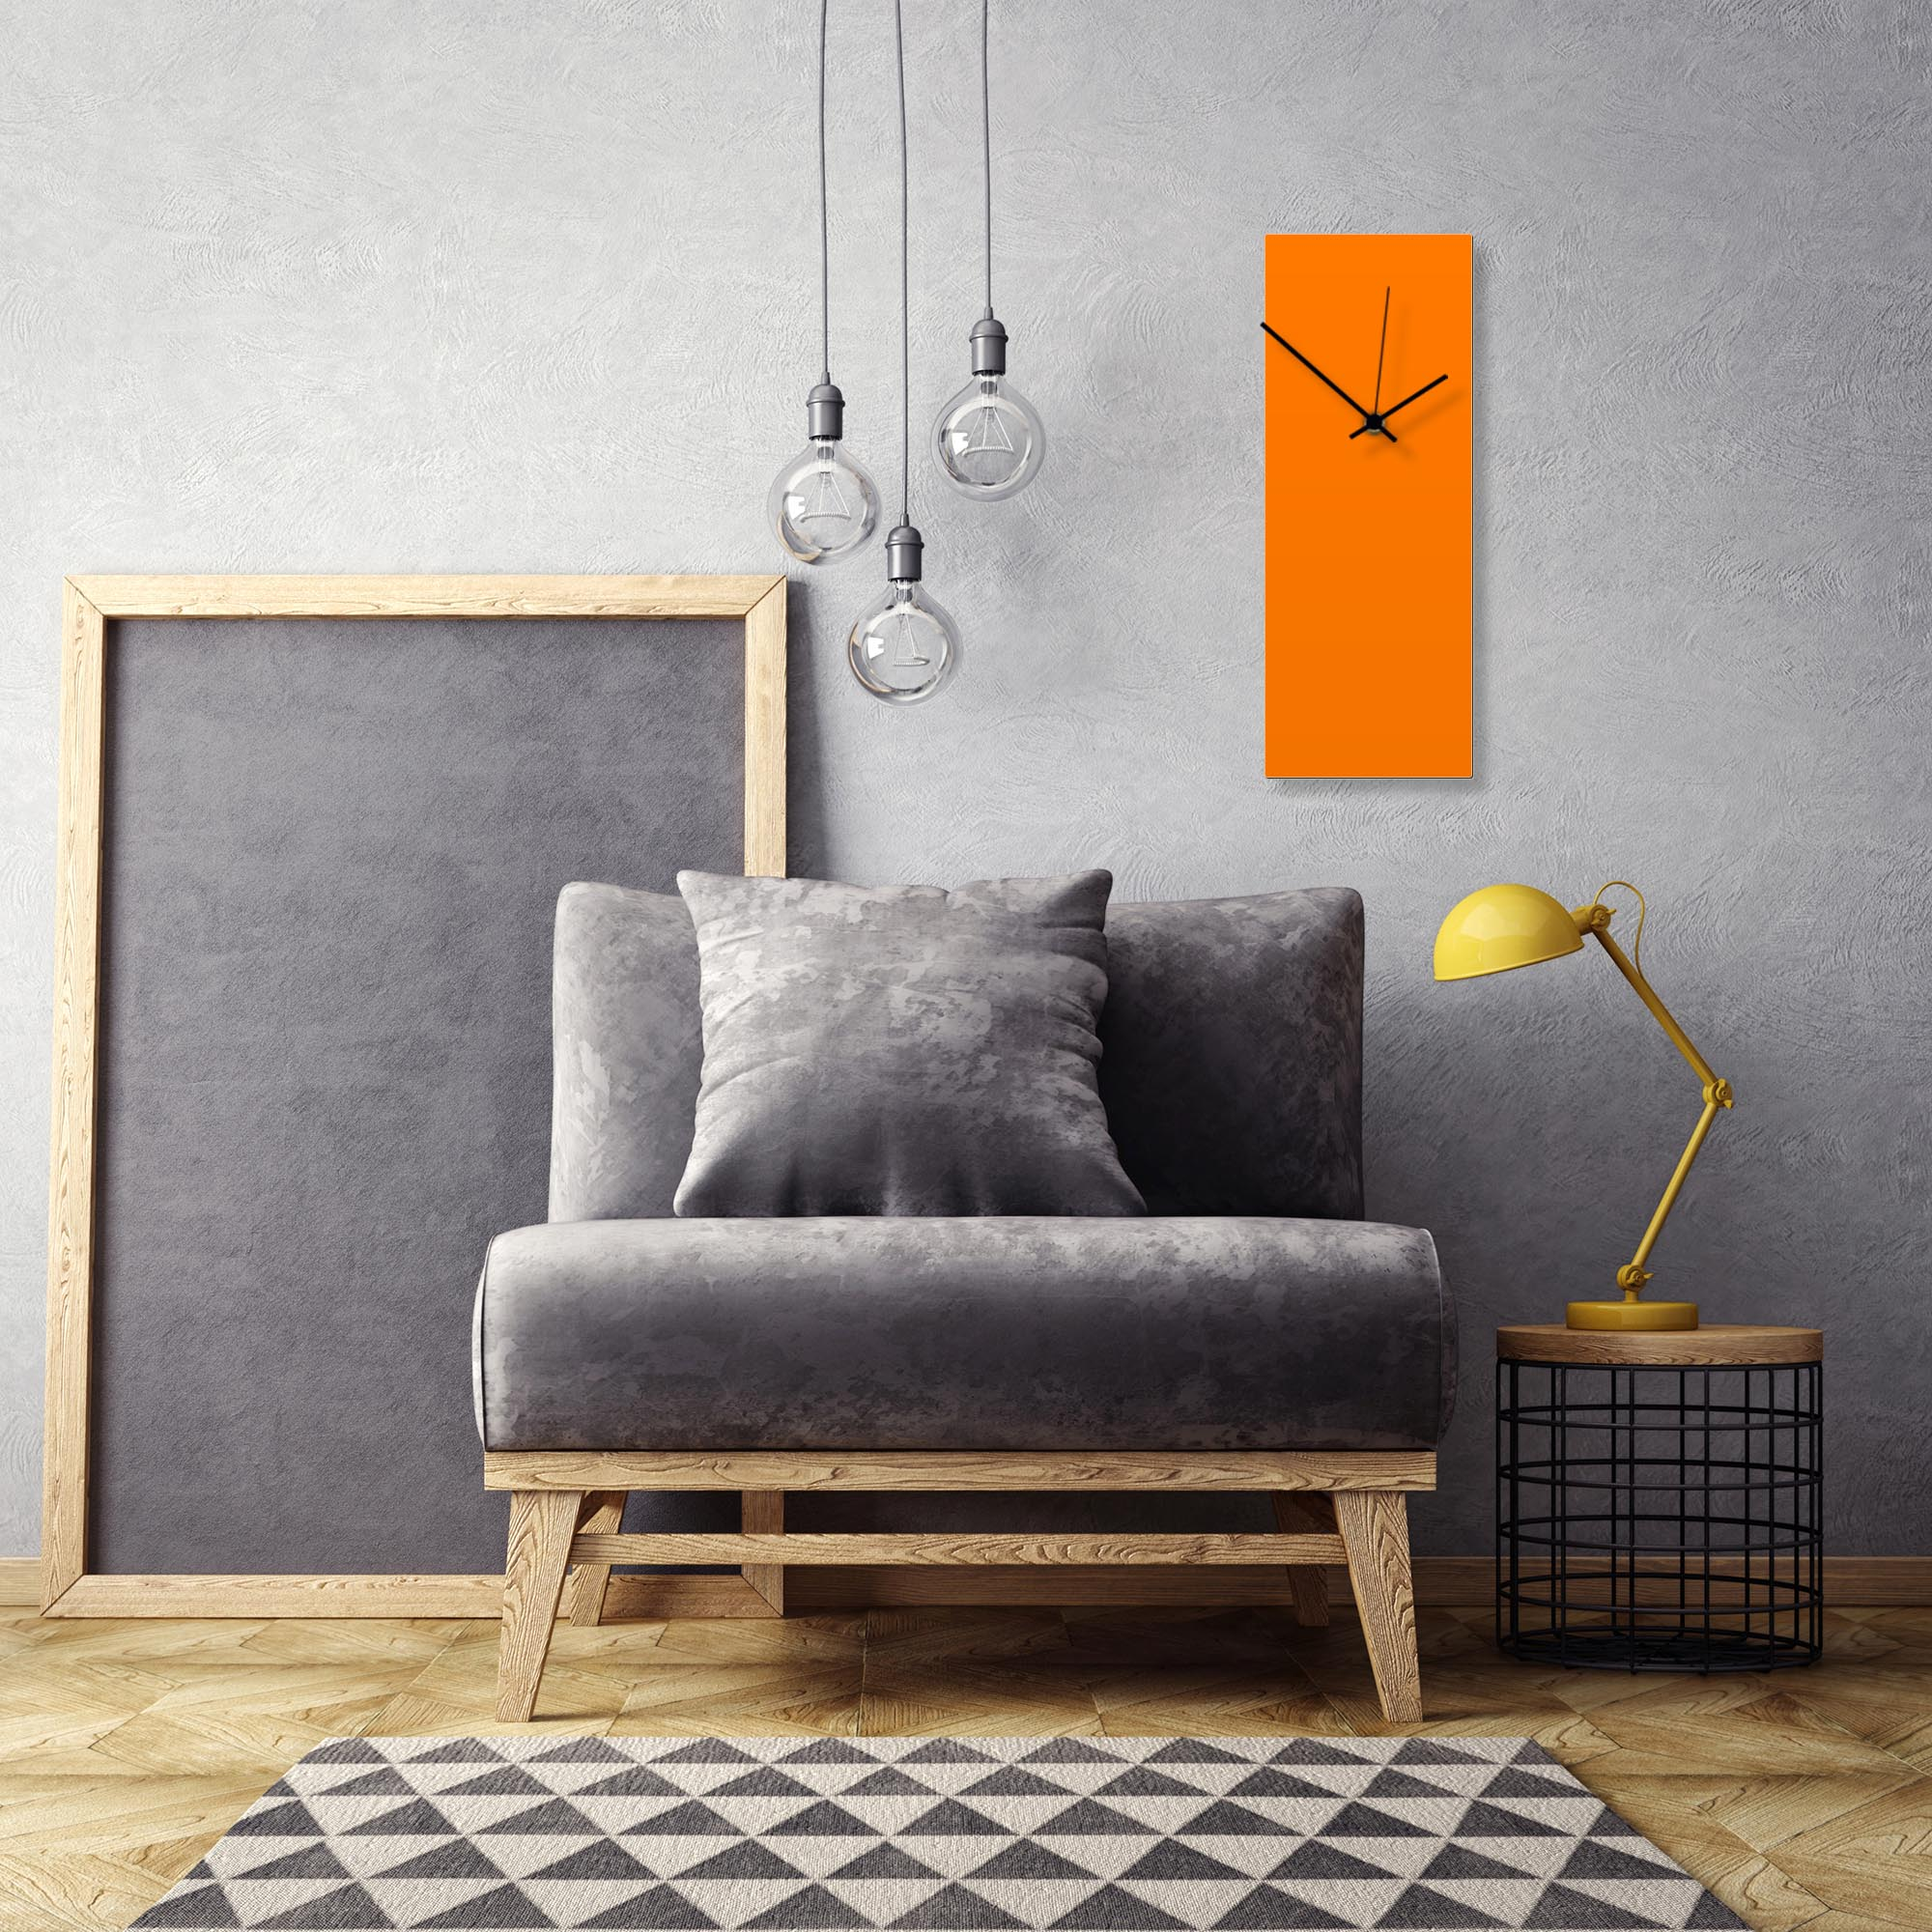 Orangeout Black Clock Large by Adam Schwoeppe Contemporary Clock on Aluminum Polymetal - Alternate View 1